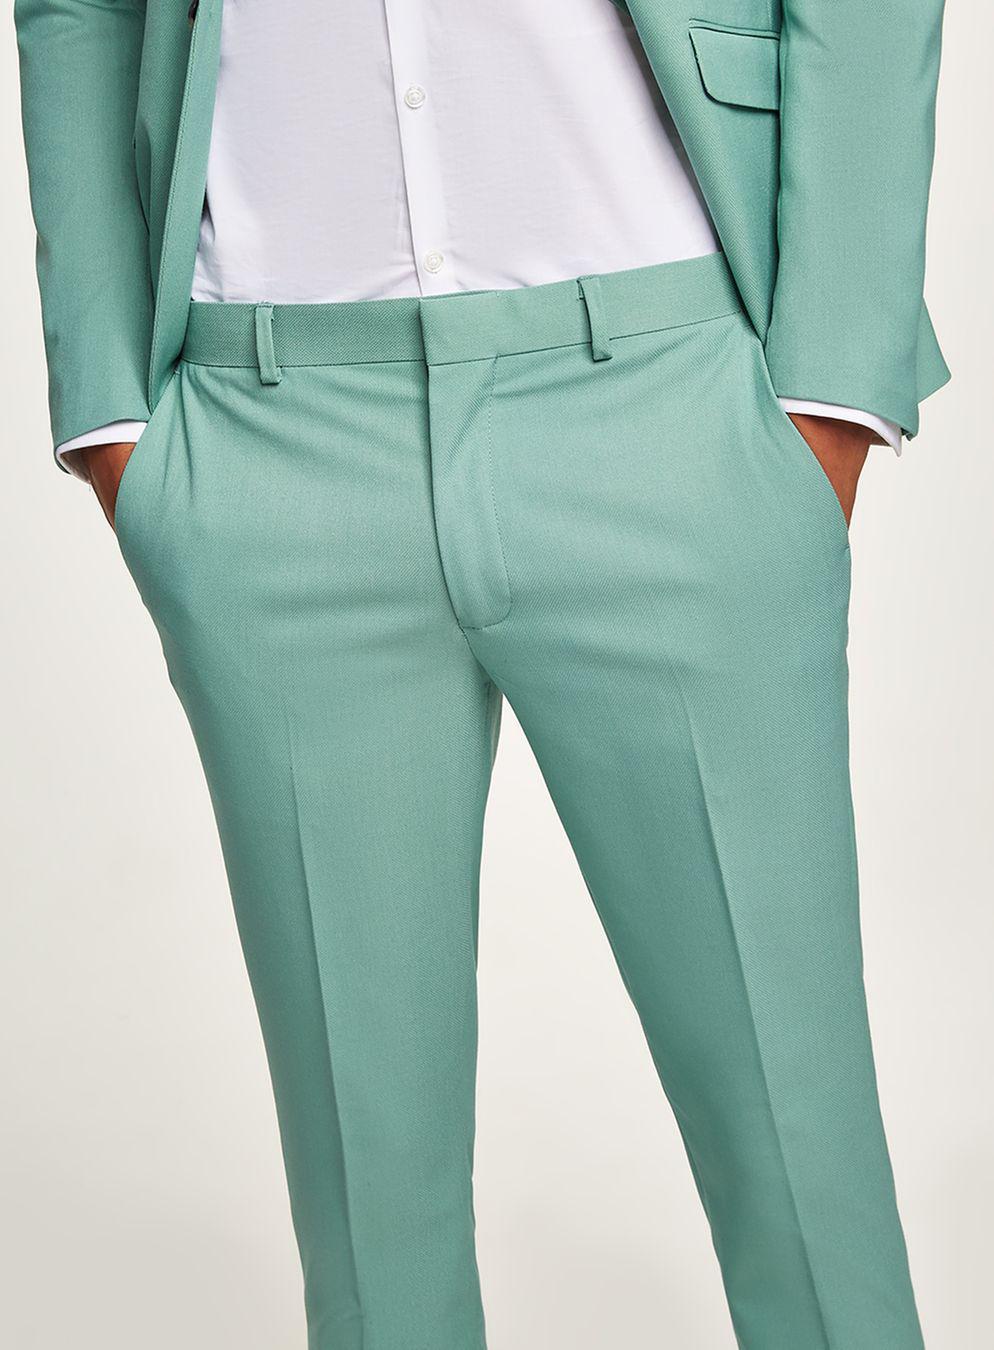 TOPMAN Synthetic Mint Green Skinny Suit Trouser for Men